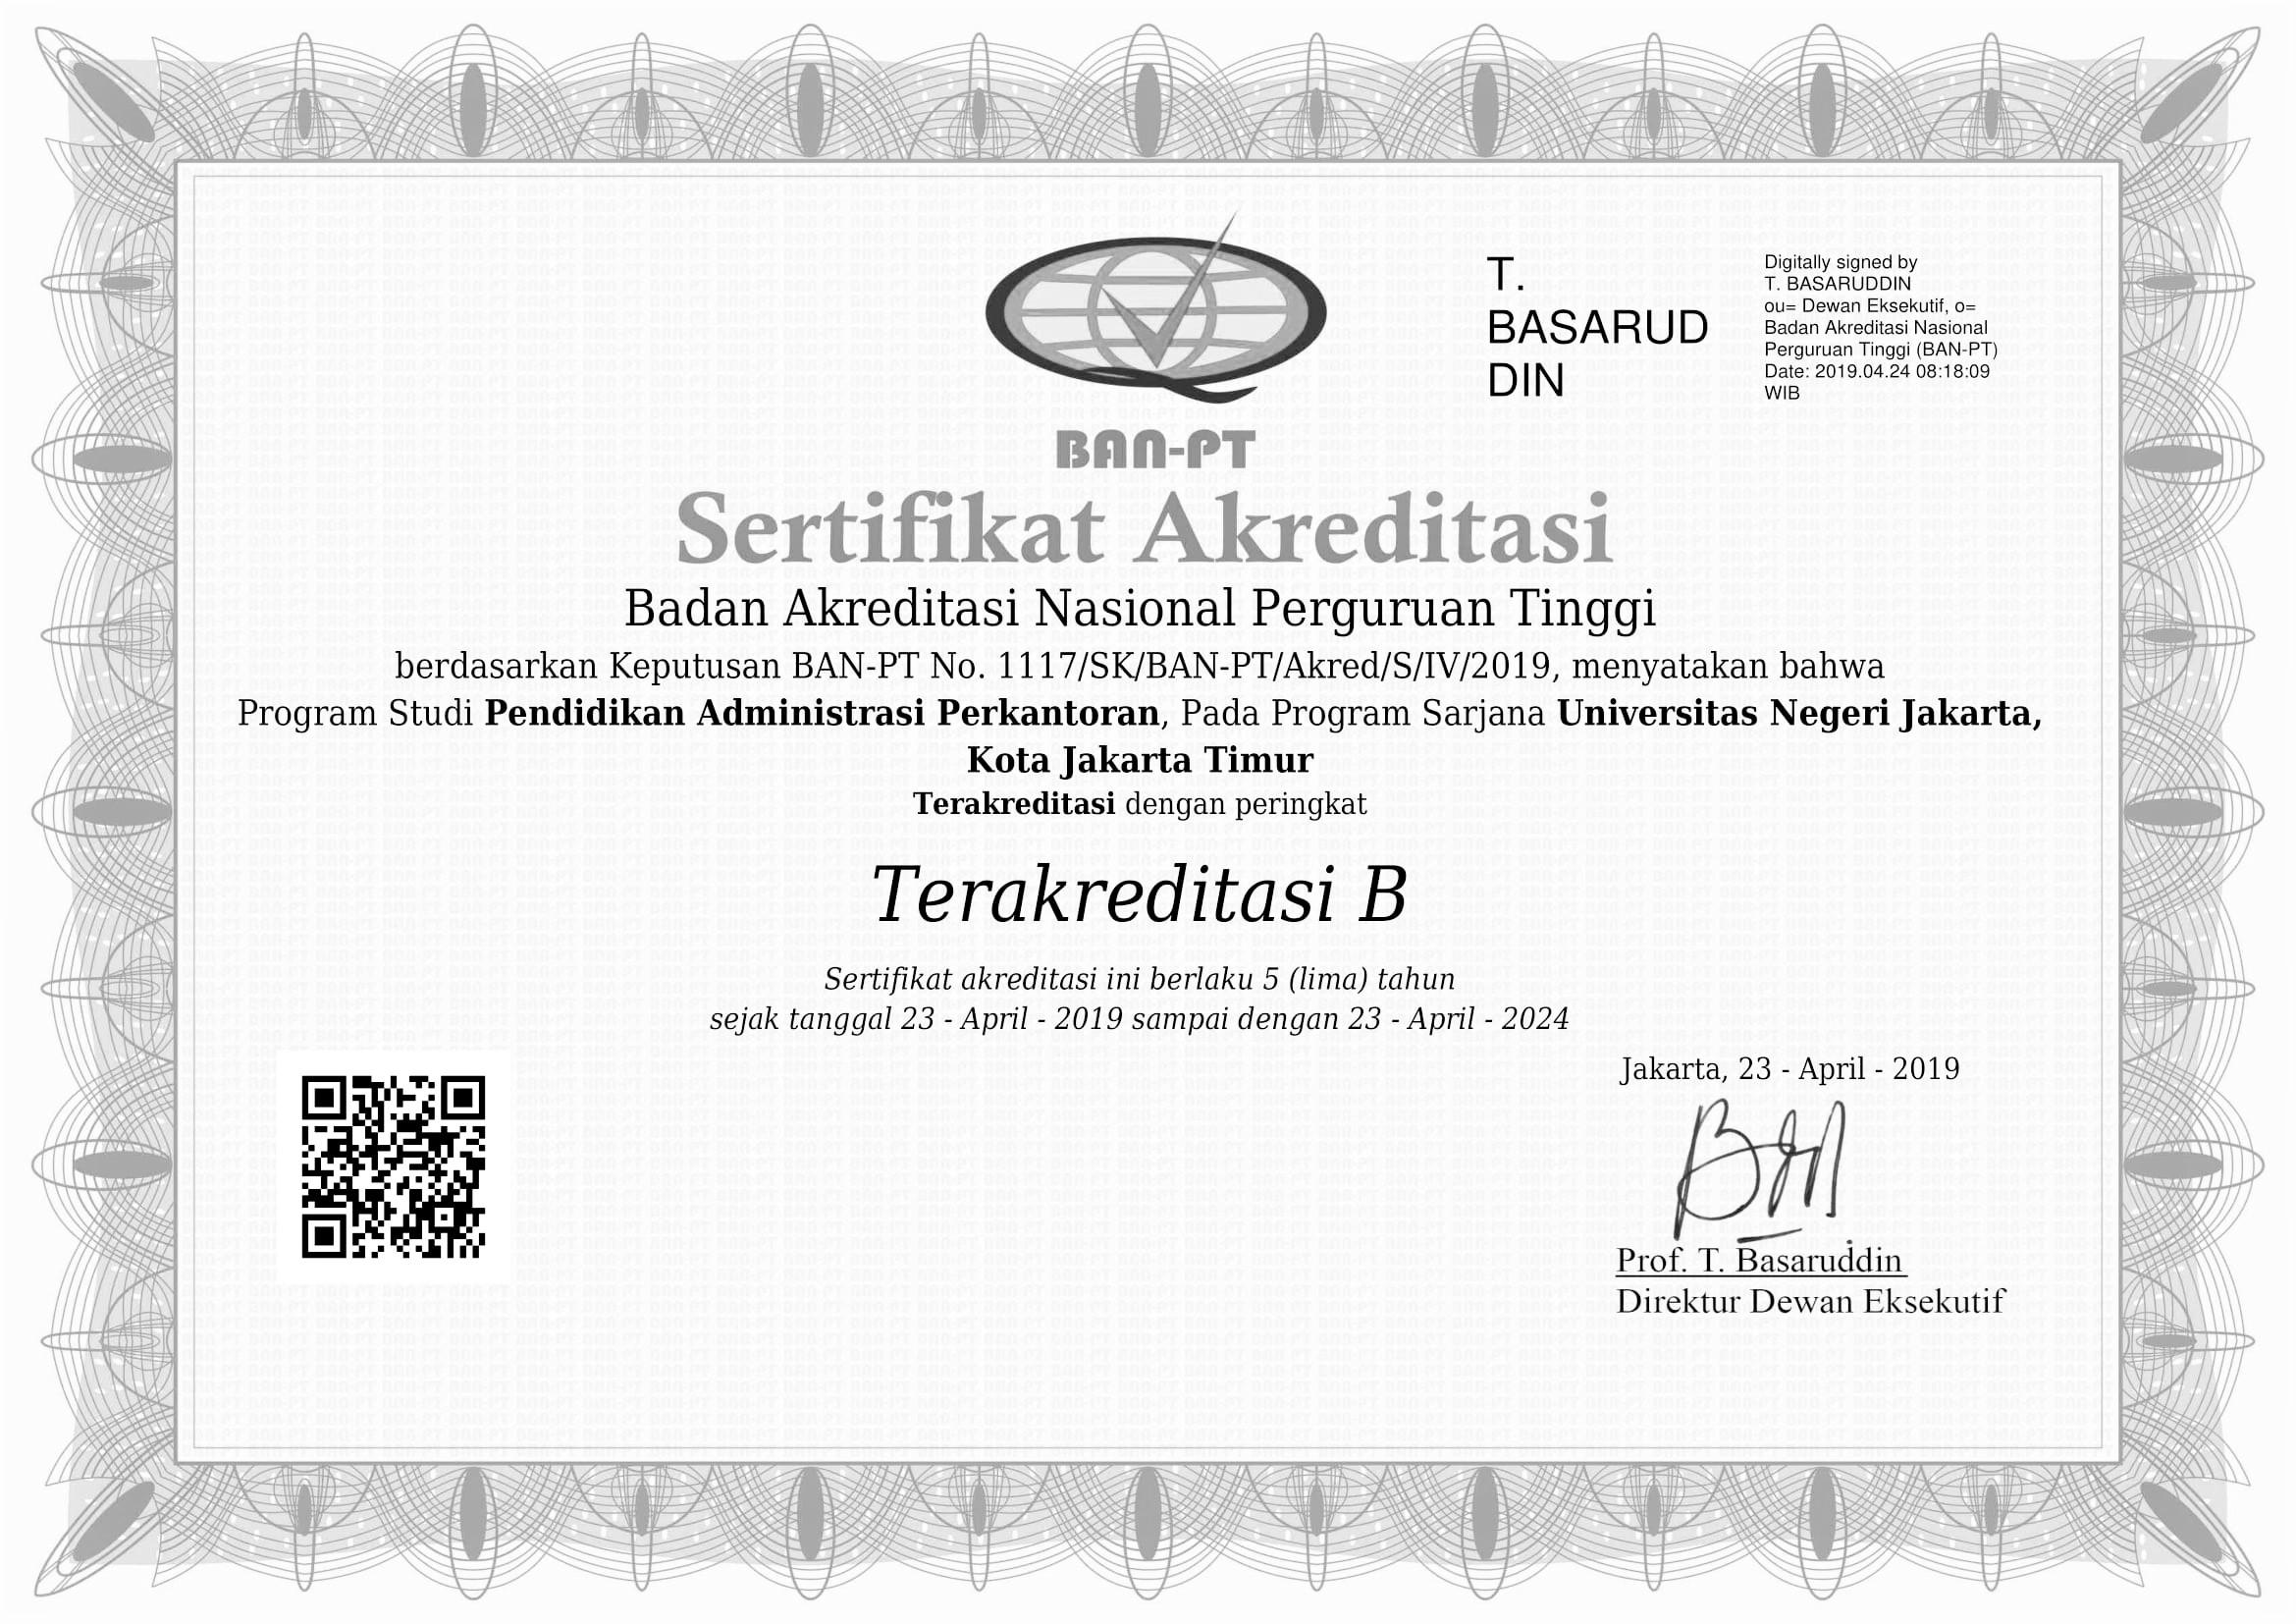 Sertifikat Akreditasi Prodi S1 Manajemen